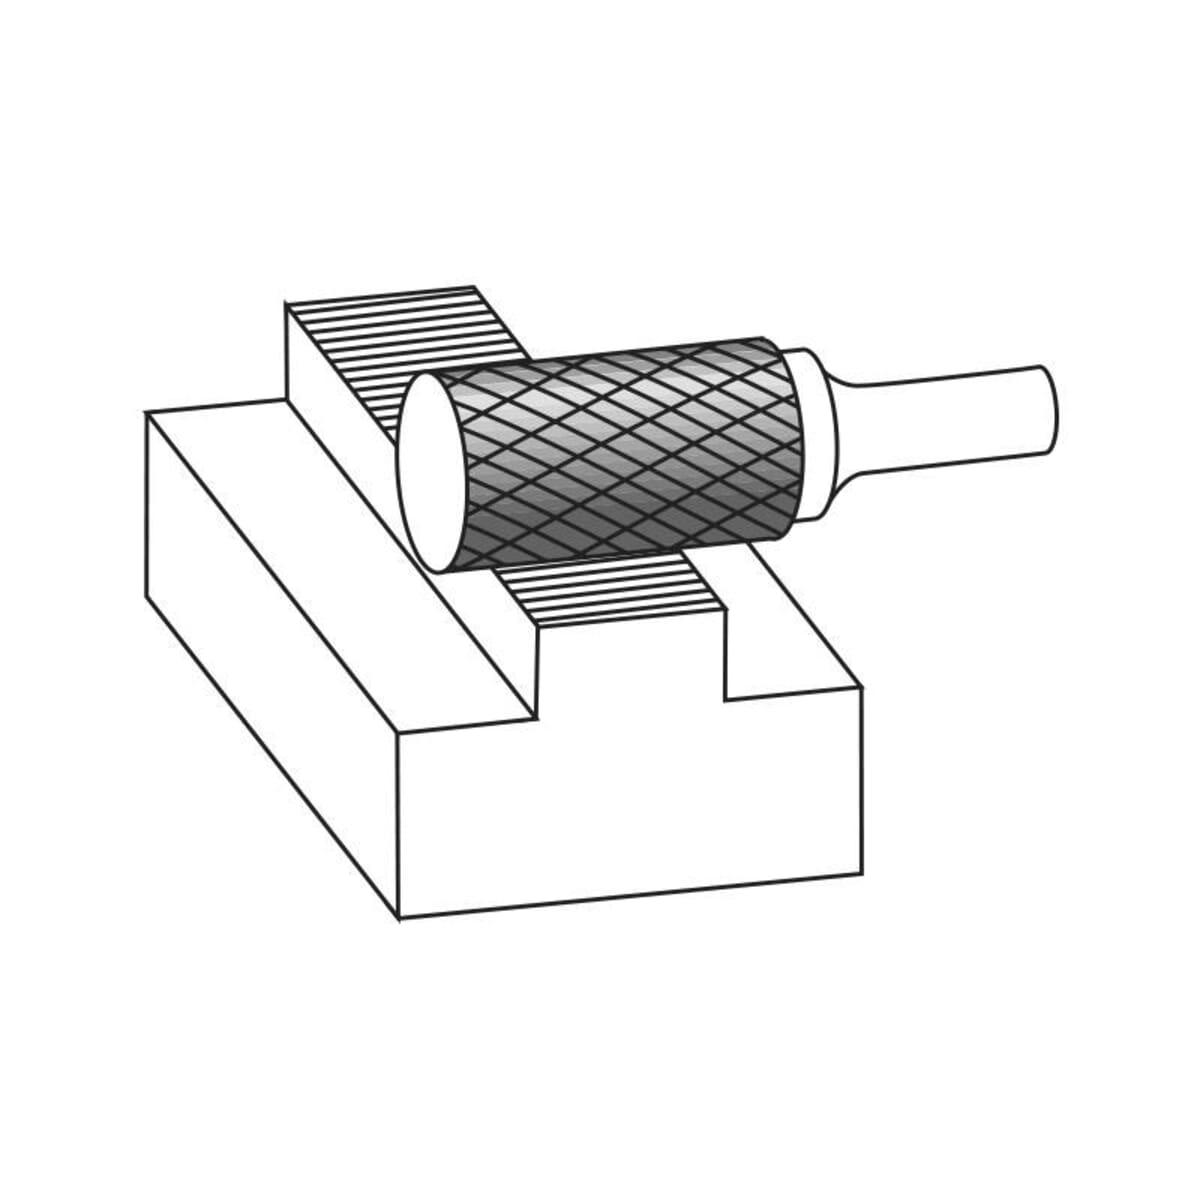 6mm (3mm) x 45mm (13mm) Cylinder Coarse Cut Burrs - Carbide (Karnasch 11.3005)